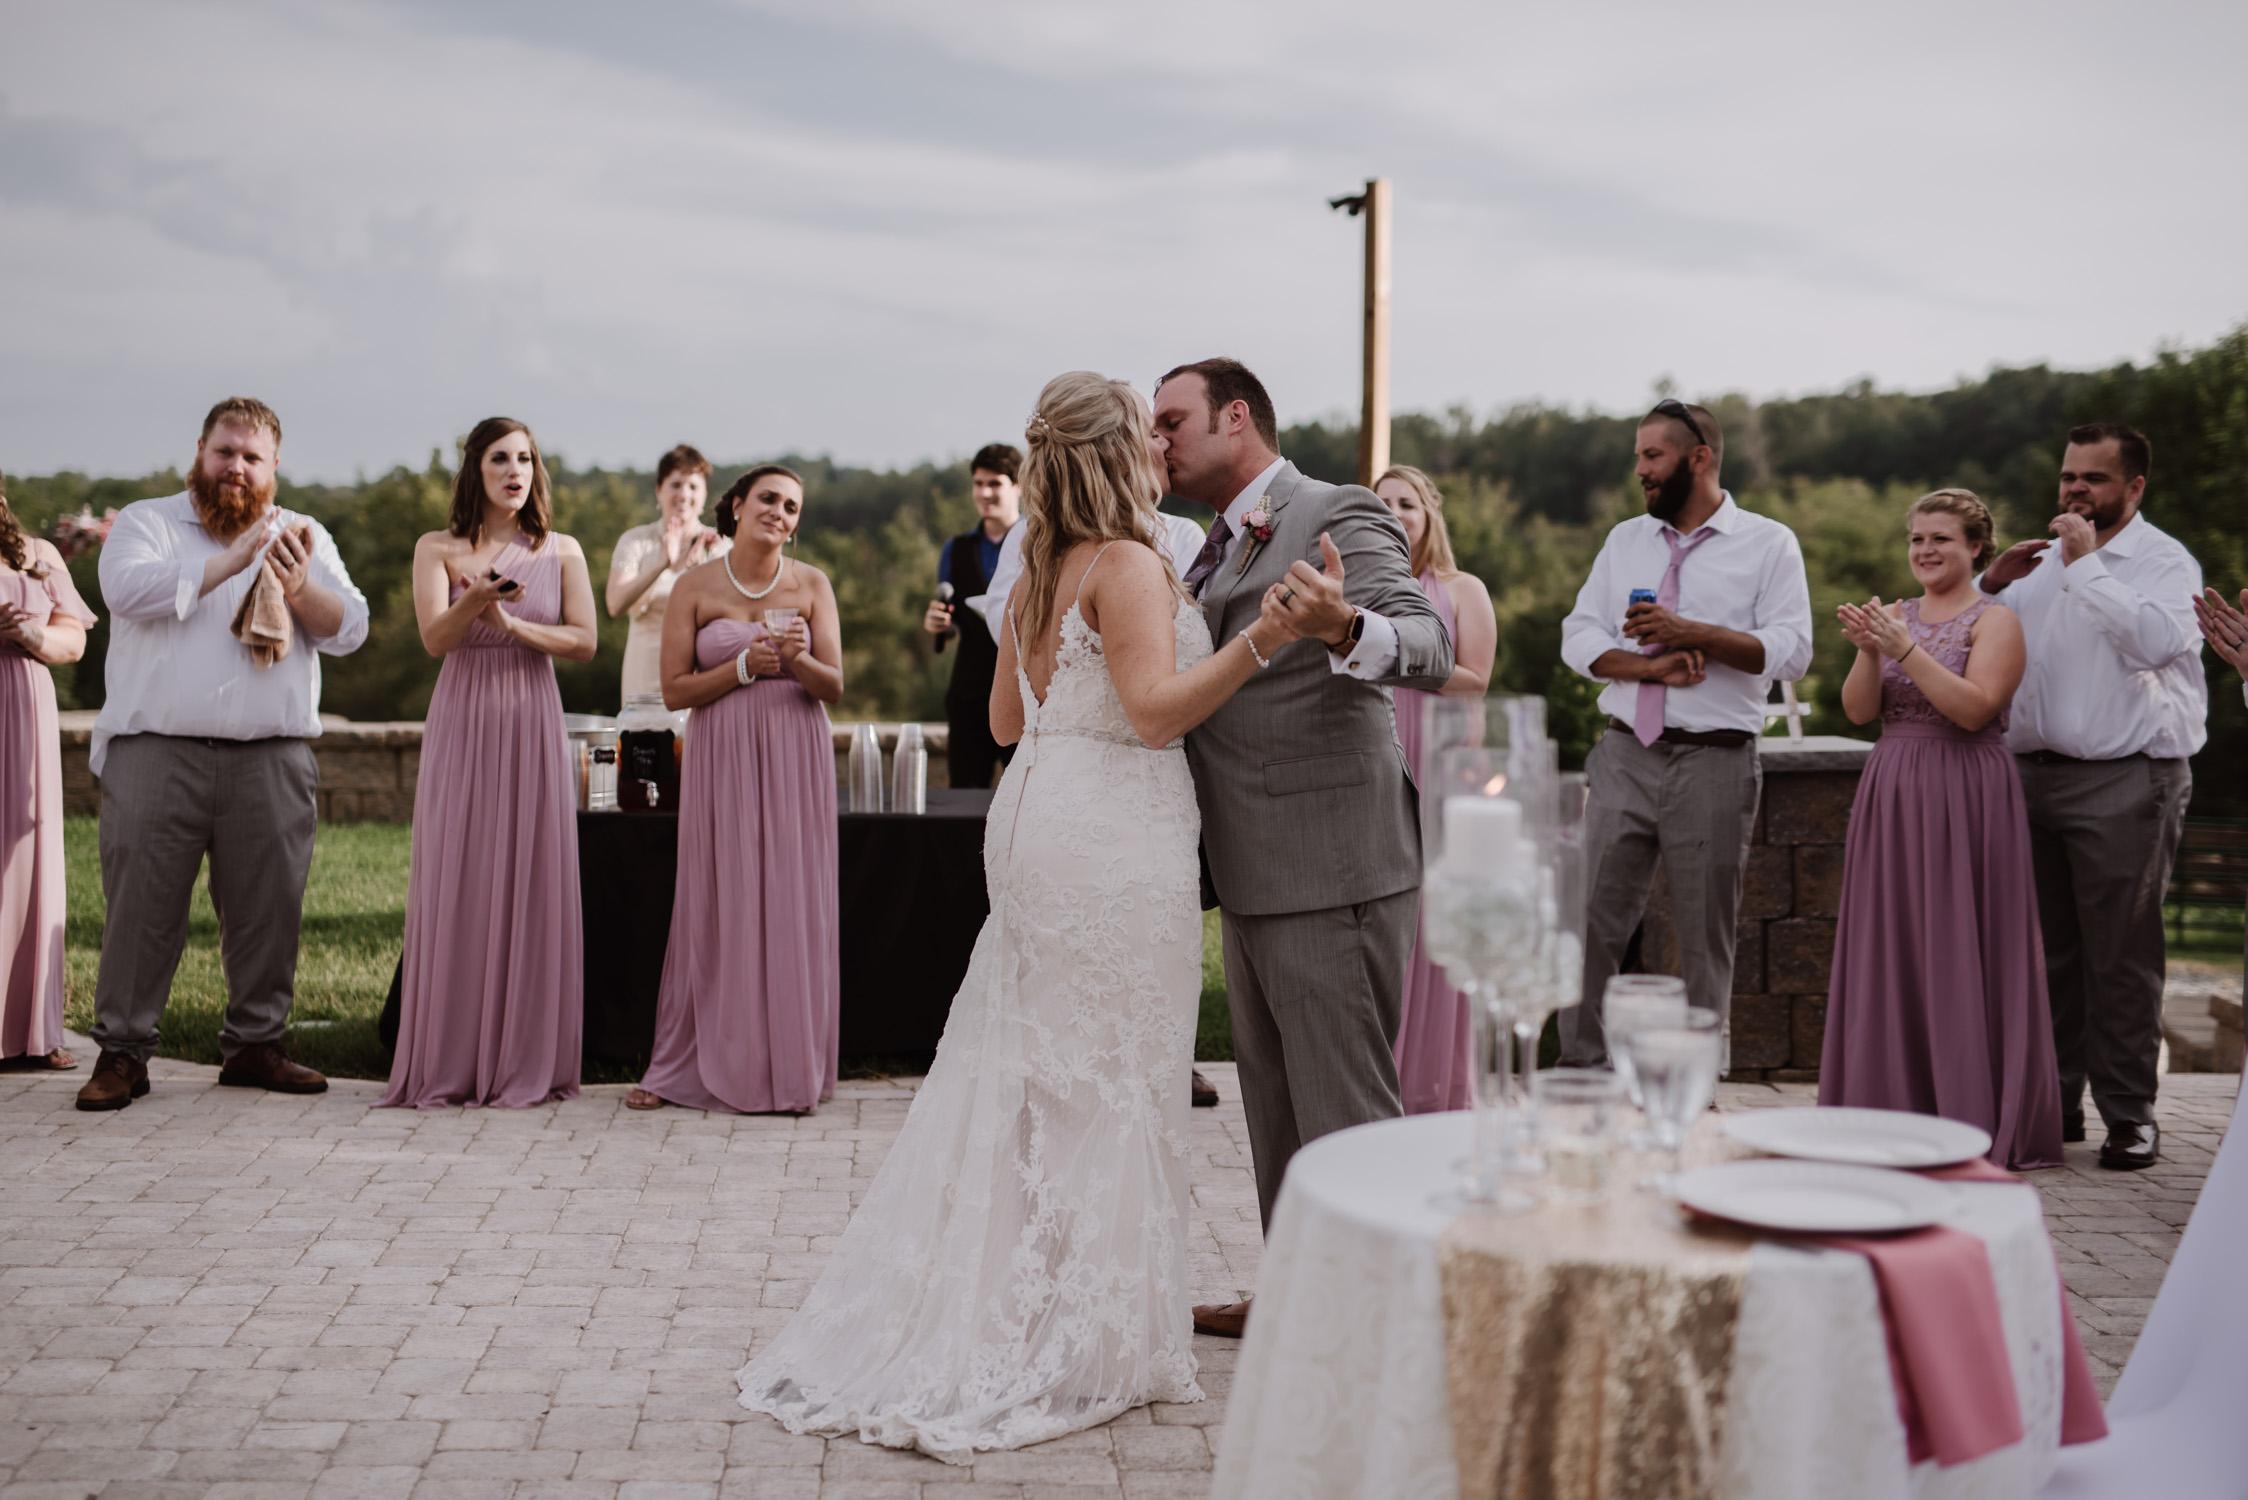 Bride and Groom Portraits by Kayli LaFon Photography | Greensboro Winston-Salem, NC Wedding Photographer | The Hideaway at Crooked Creek, Whitsett